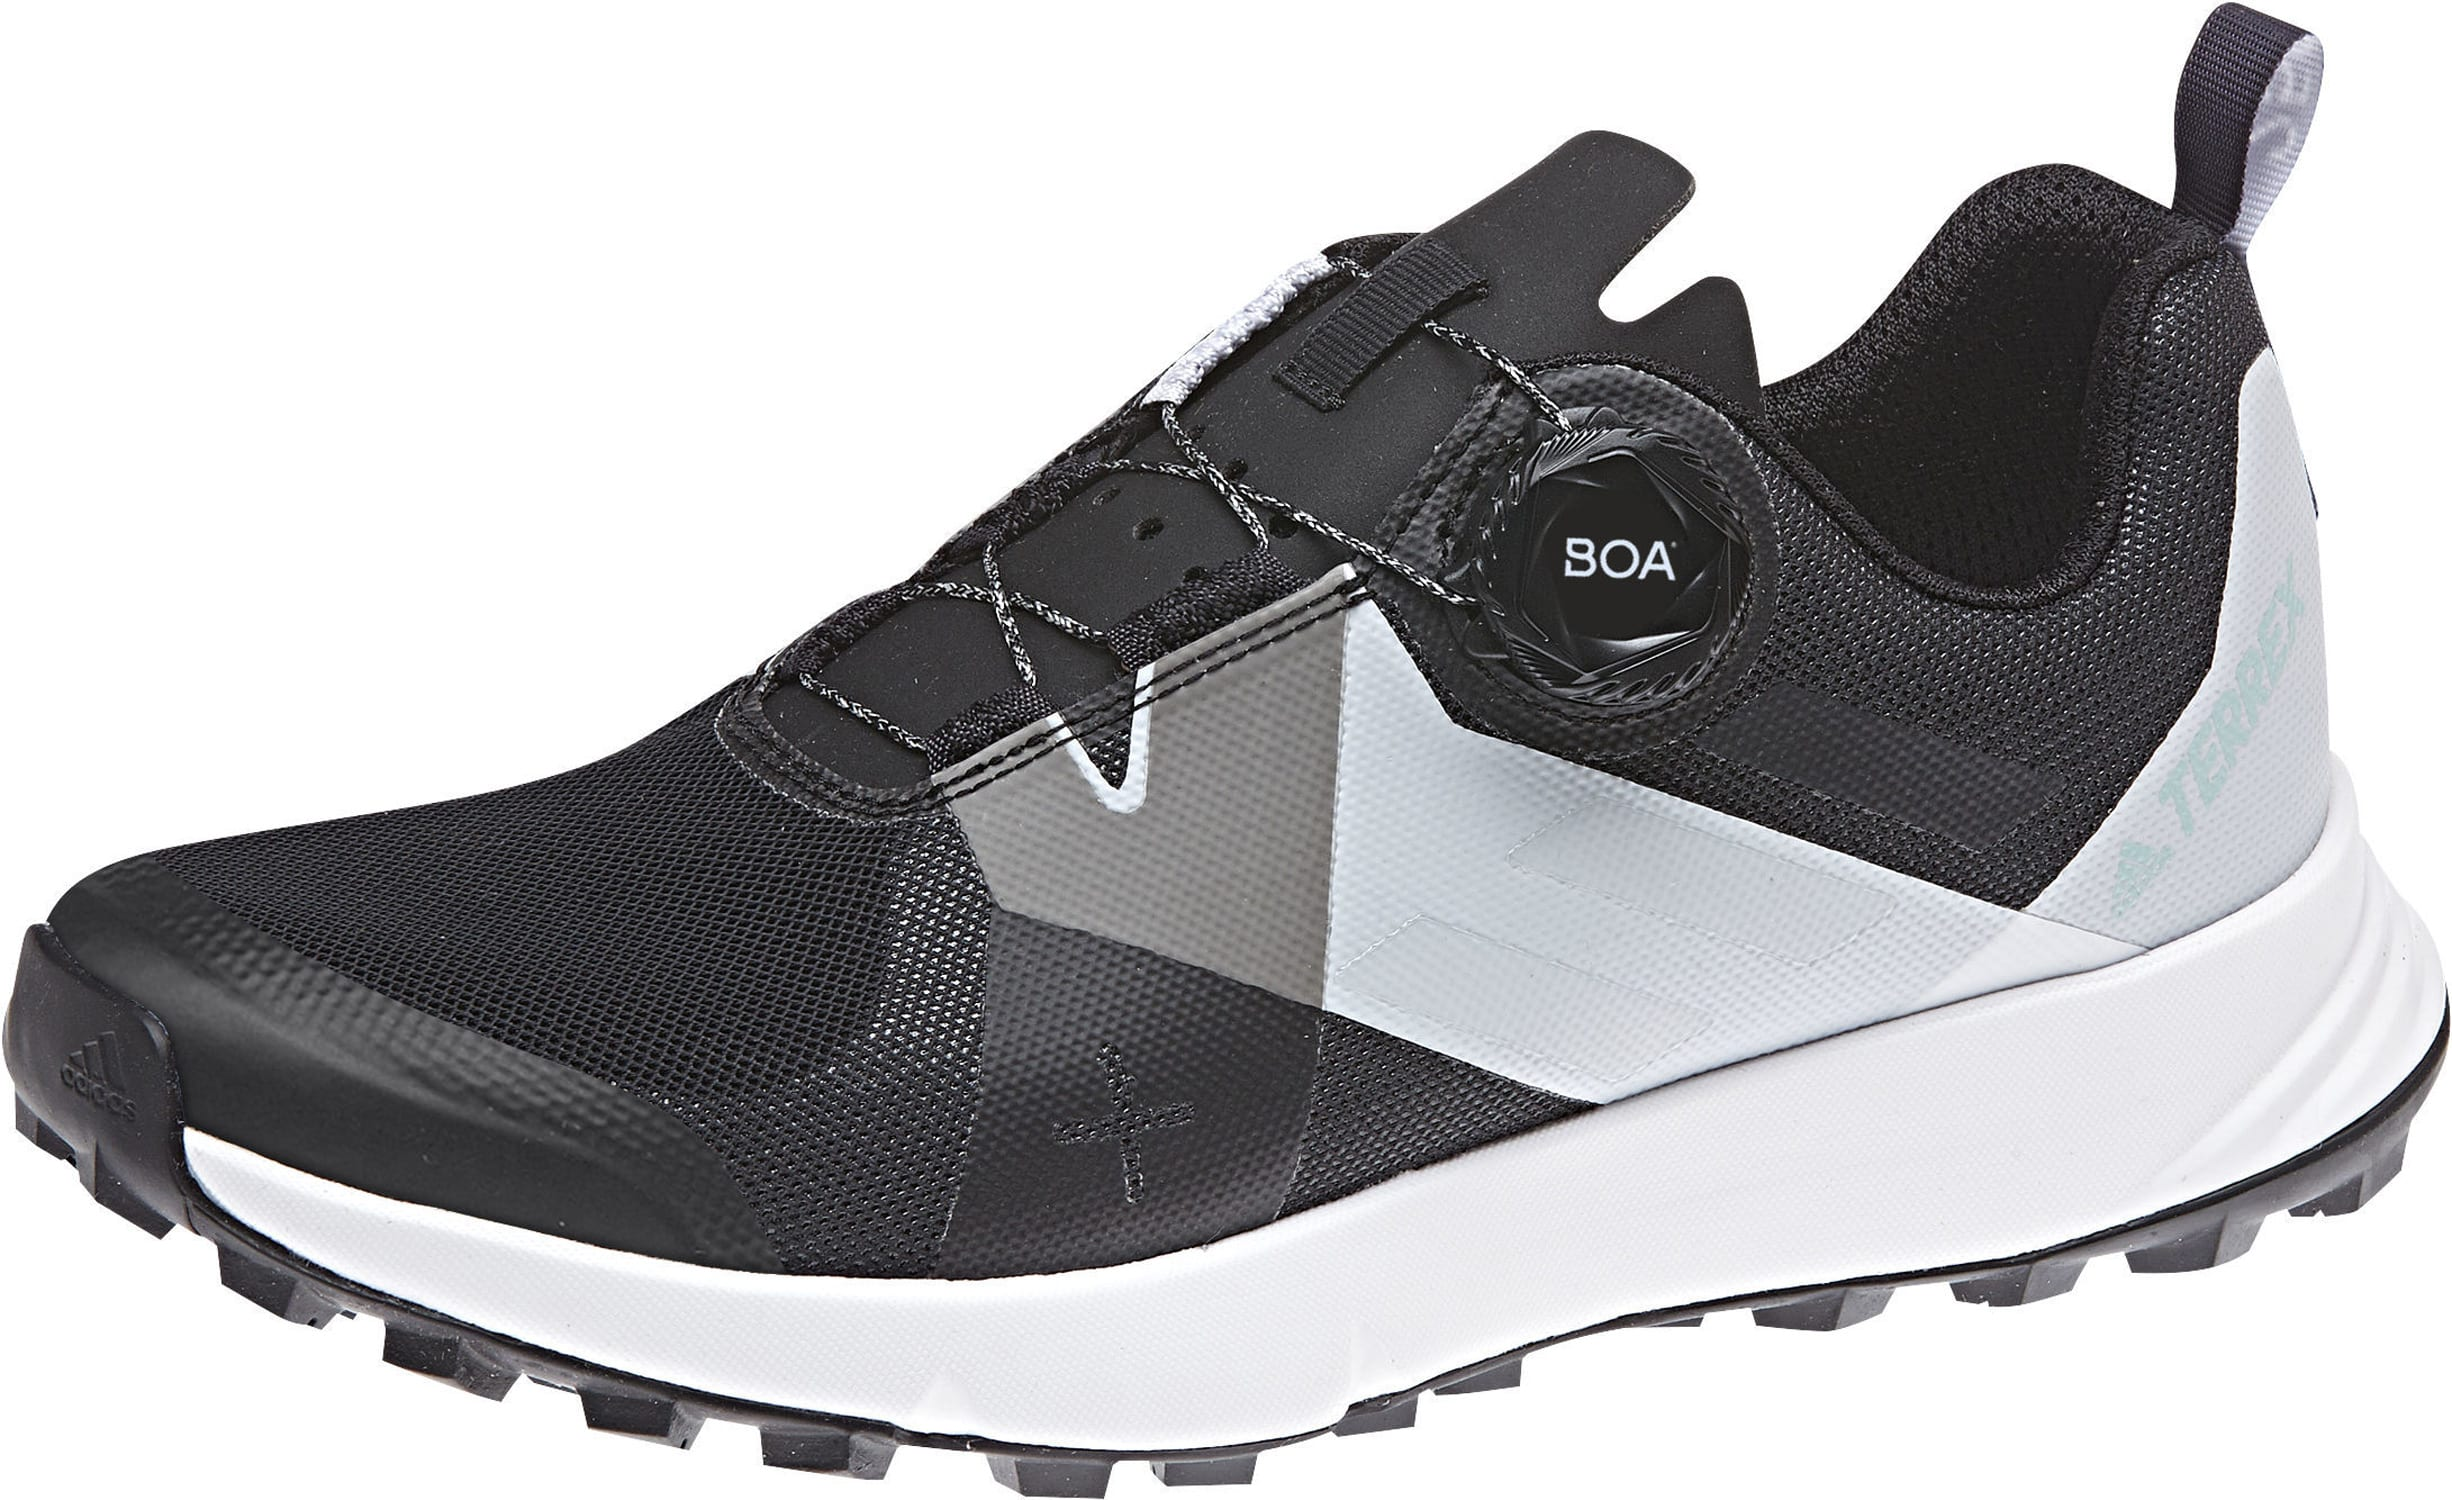 6e90689546 Adidas Terrex Two BOA Trail Running Shoes - Womens